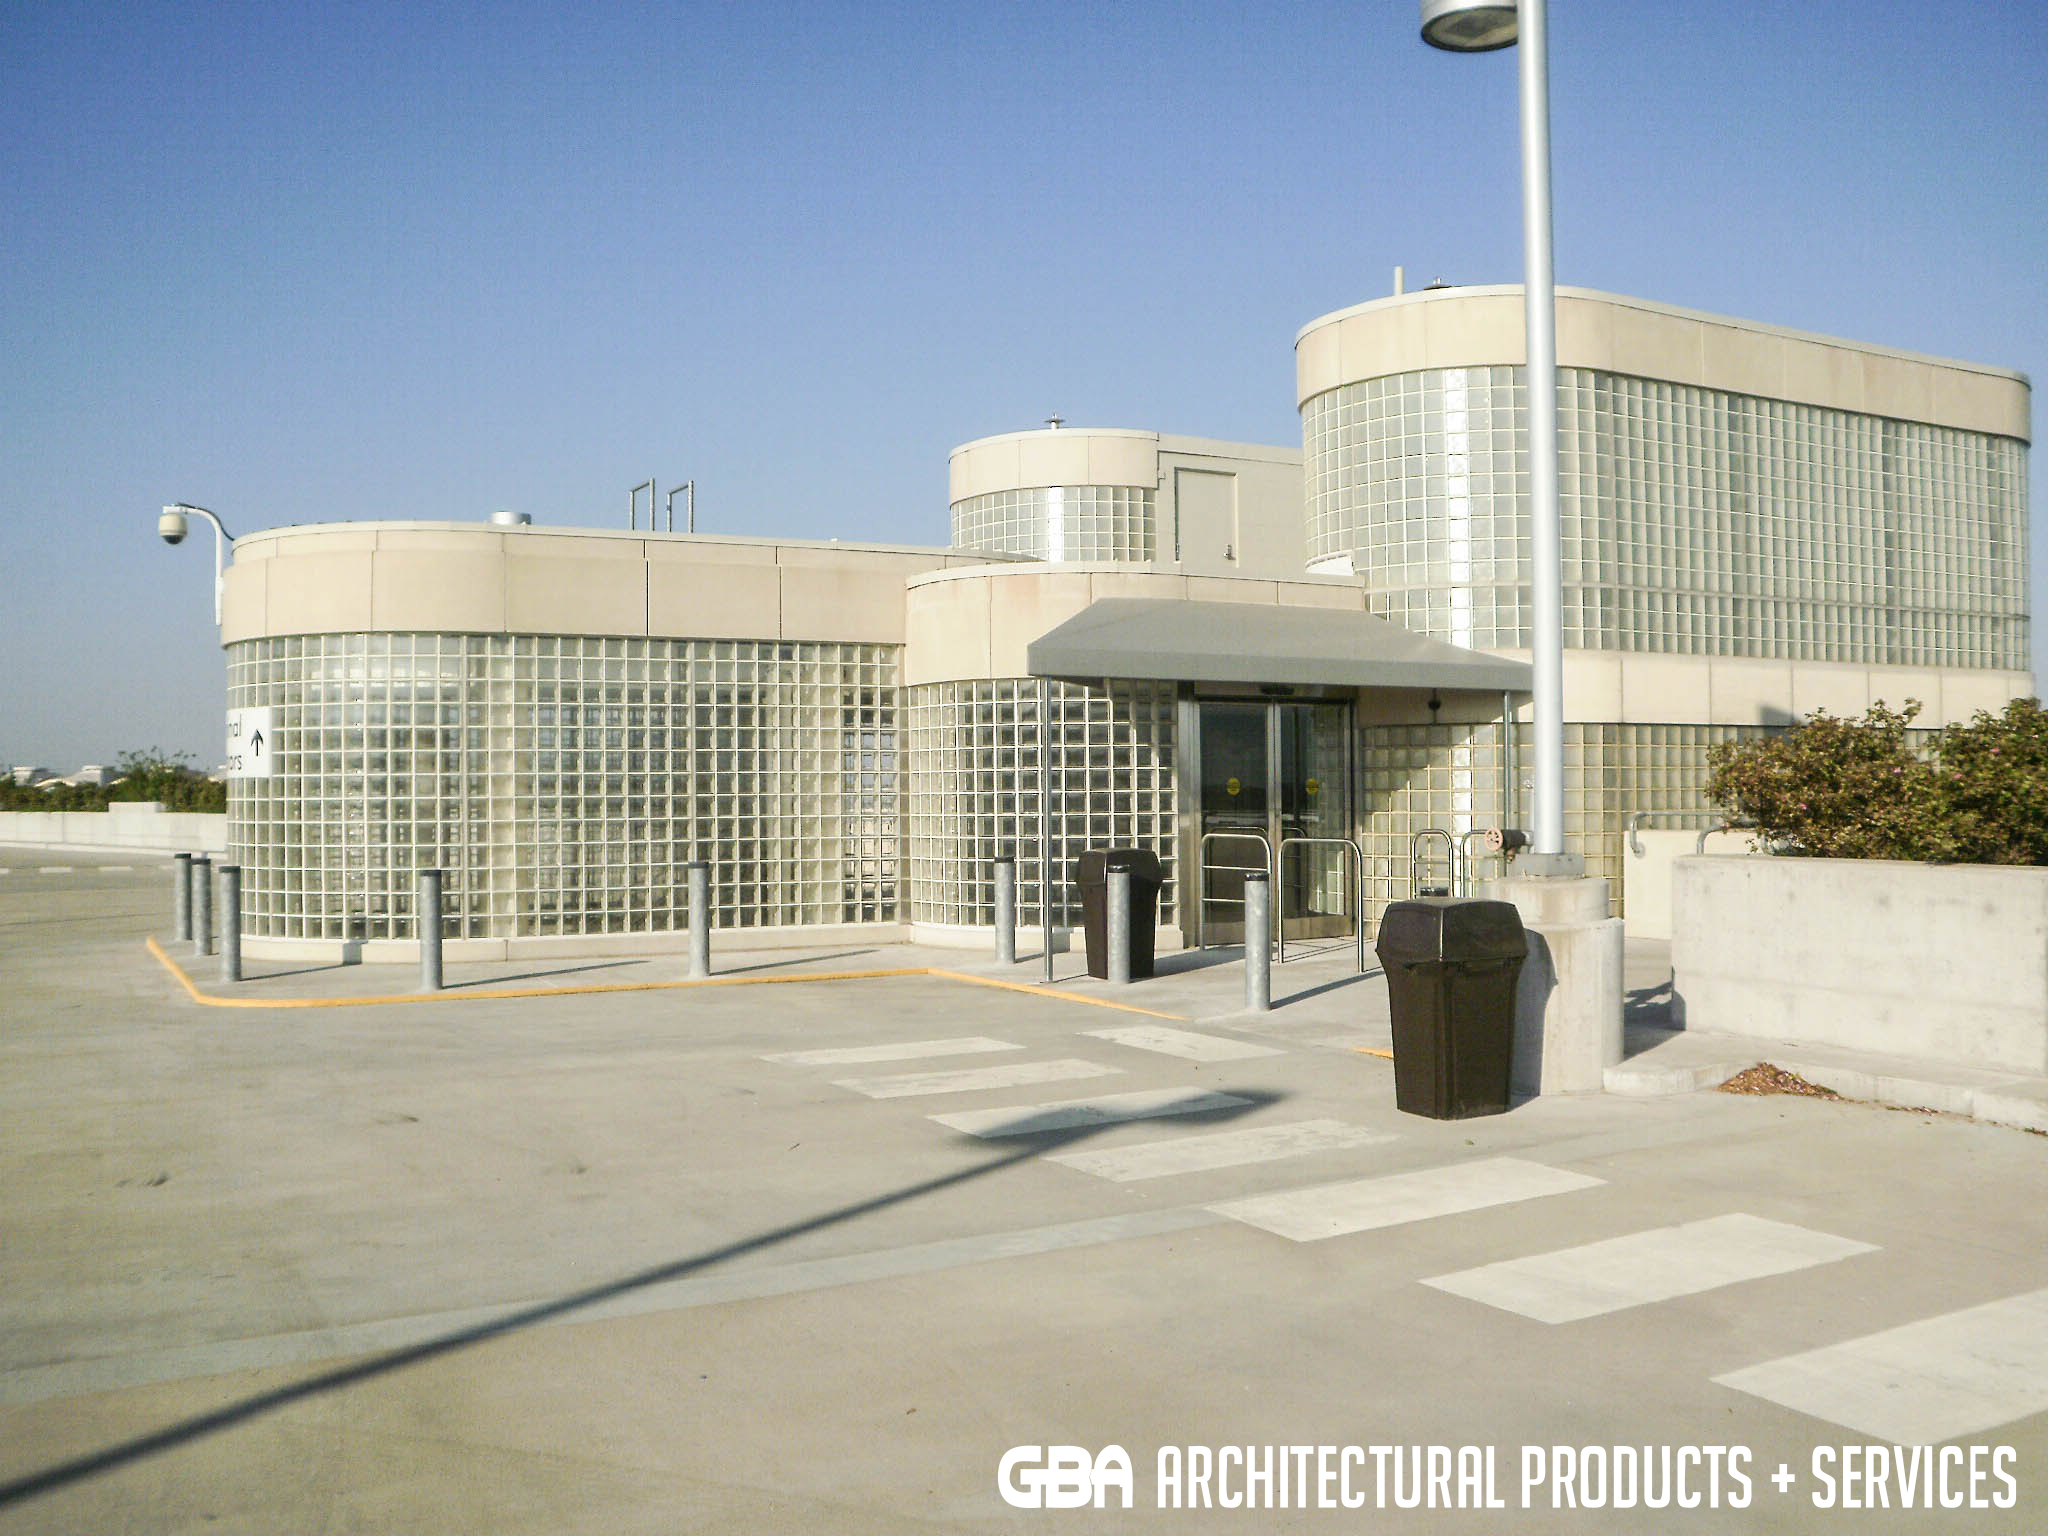 Xronald-reagan-national-airport-parking-garage-washington-dc-154_7109678675_o